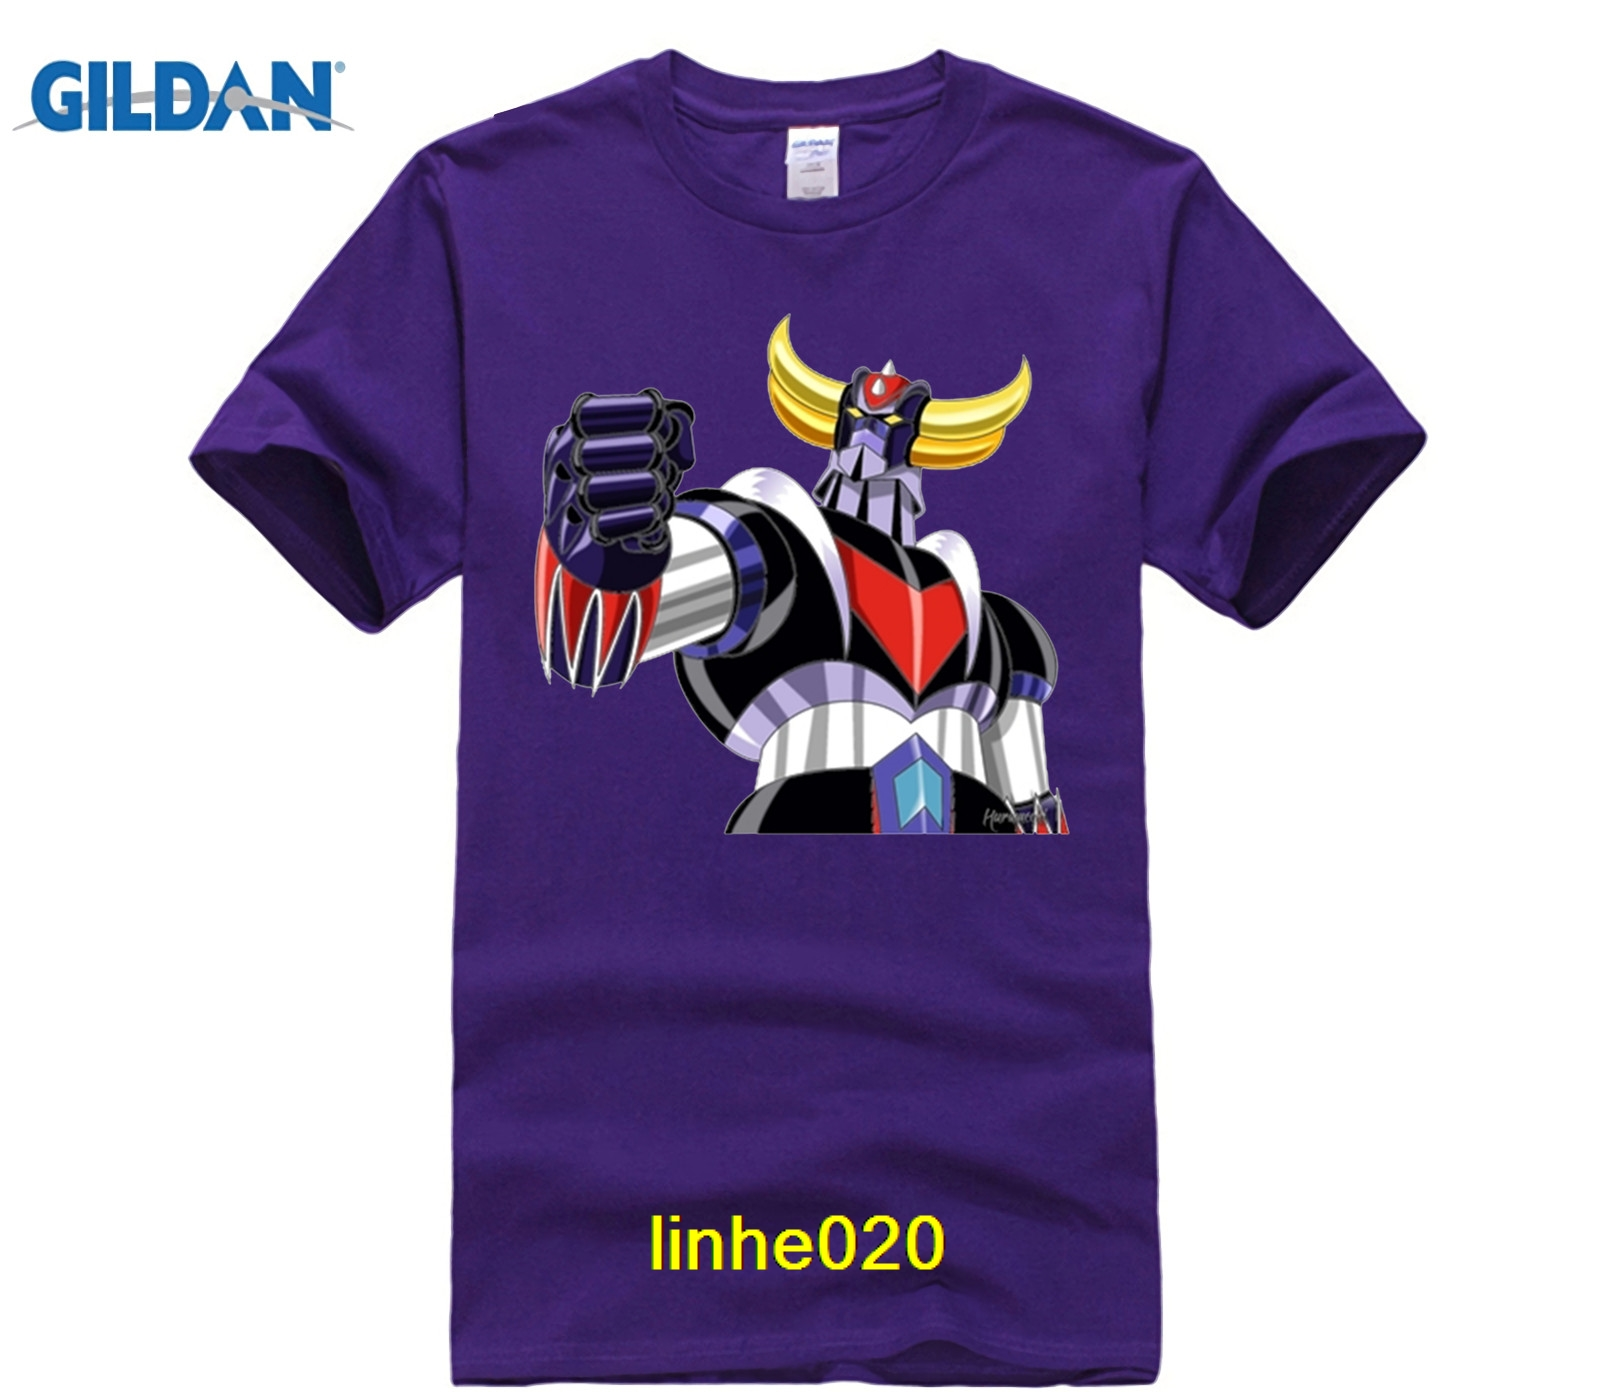 fdcbf4e129d GILDAN customised t-shirts UFO Robot Grendizer T Shirt Man s 100% Cotton Short  Sleeve Crew Neck Tshirt Teens Costume